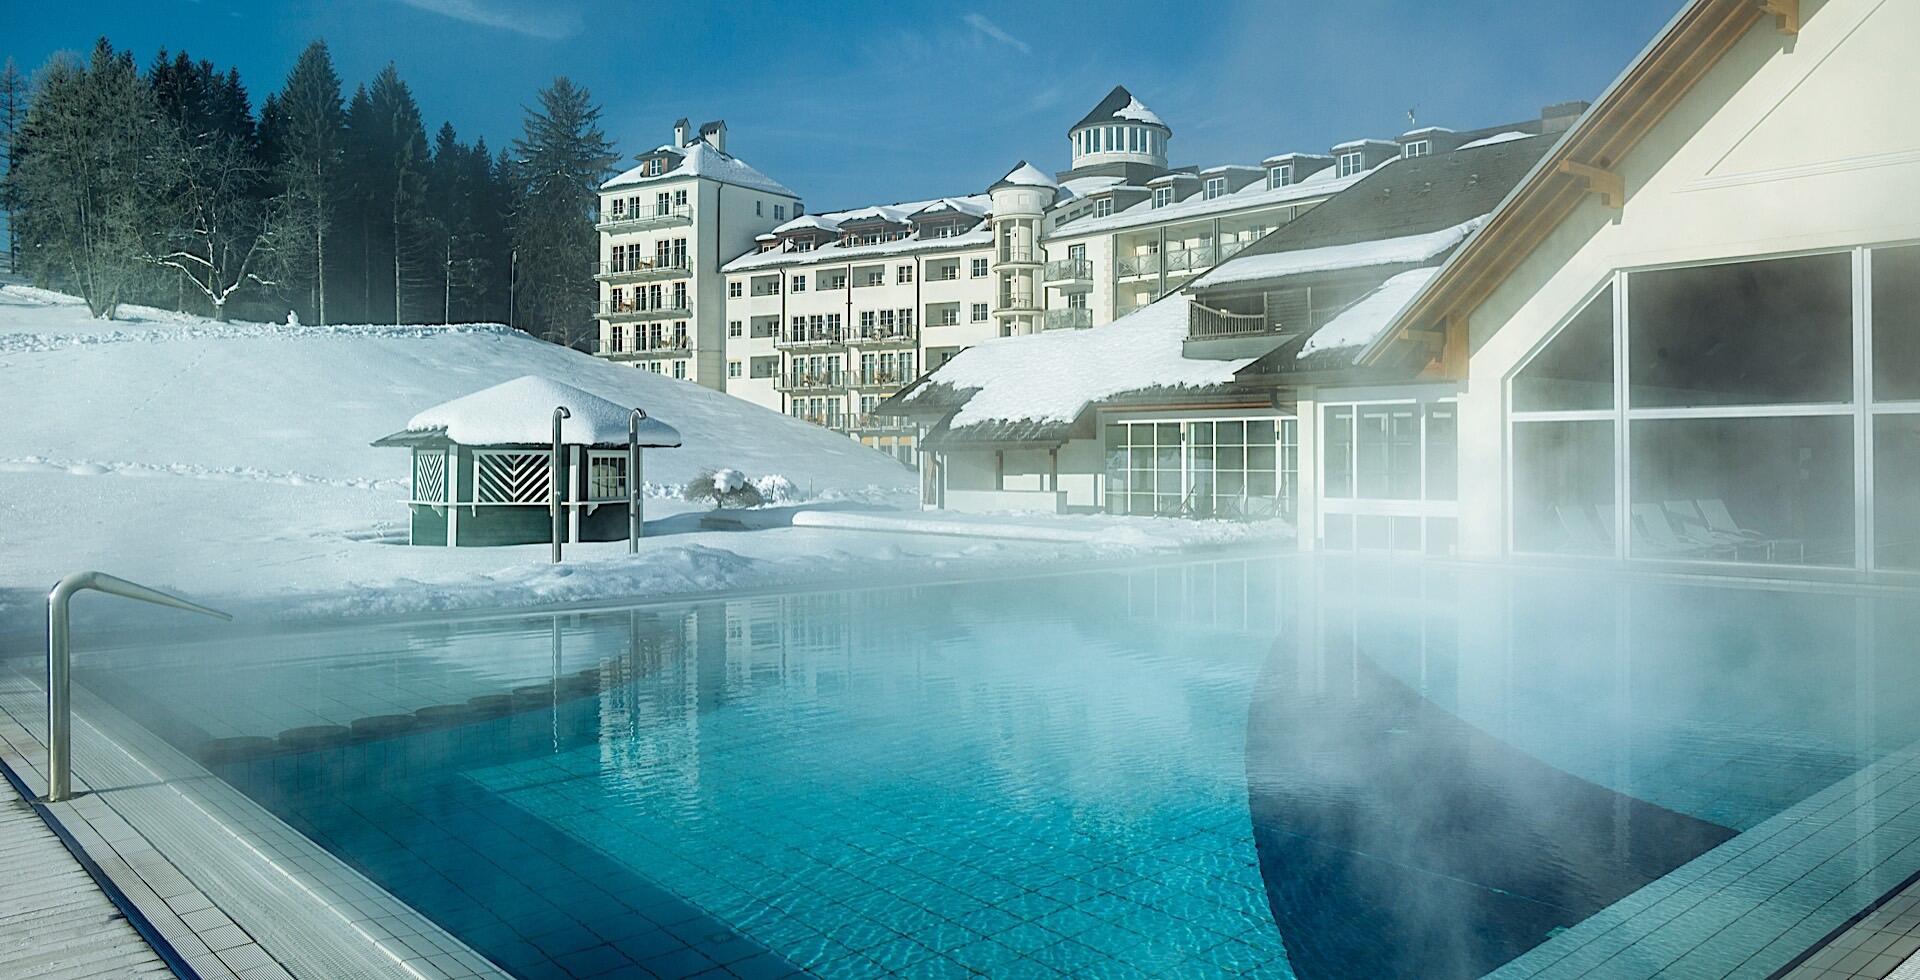 Outdoor Pool in Winter at Romantik Hotel Schloss Pichlarn